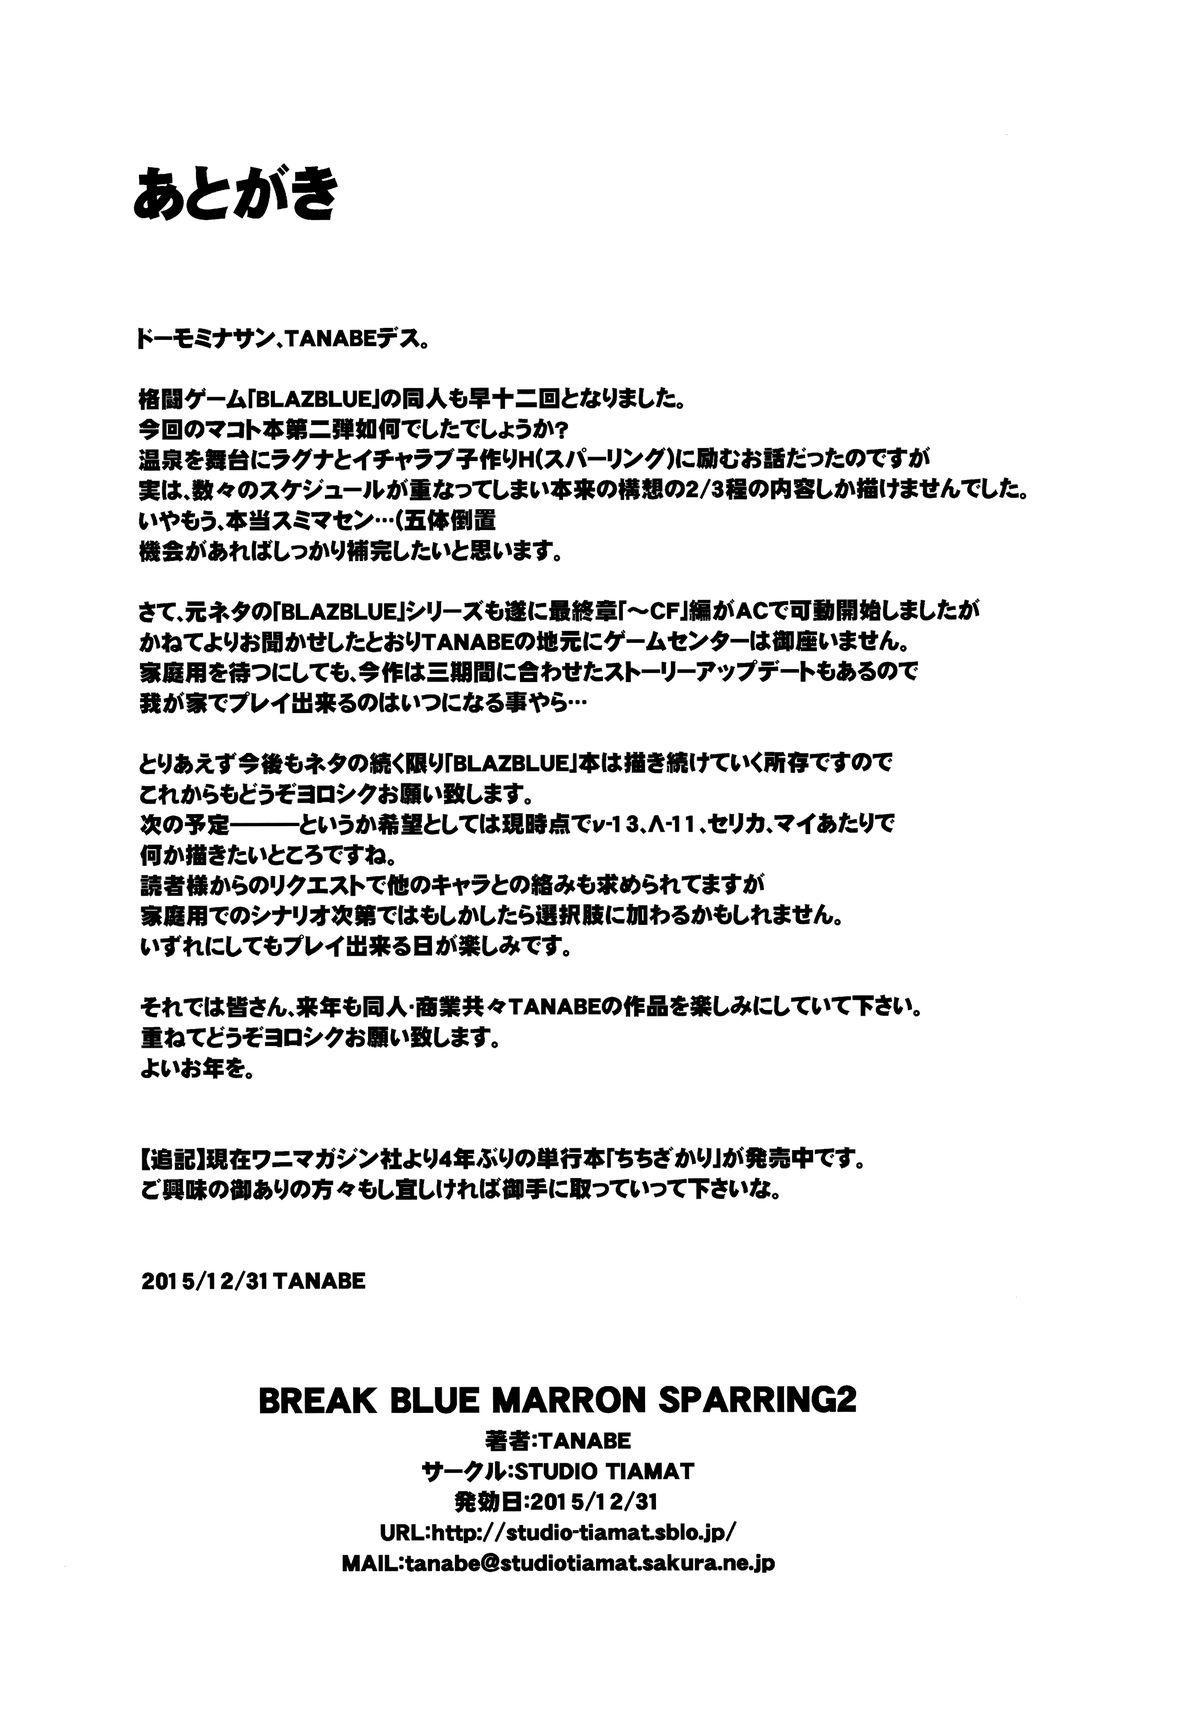 BREAK BLUE MARRON SPARRING2 24